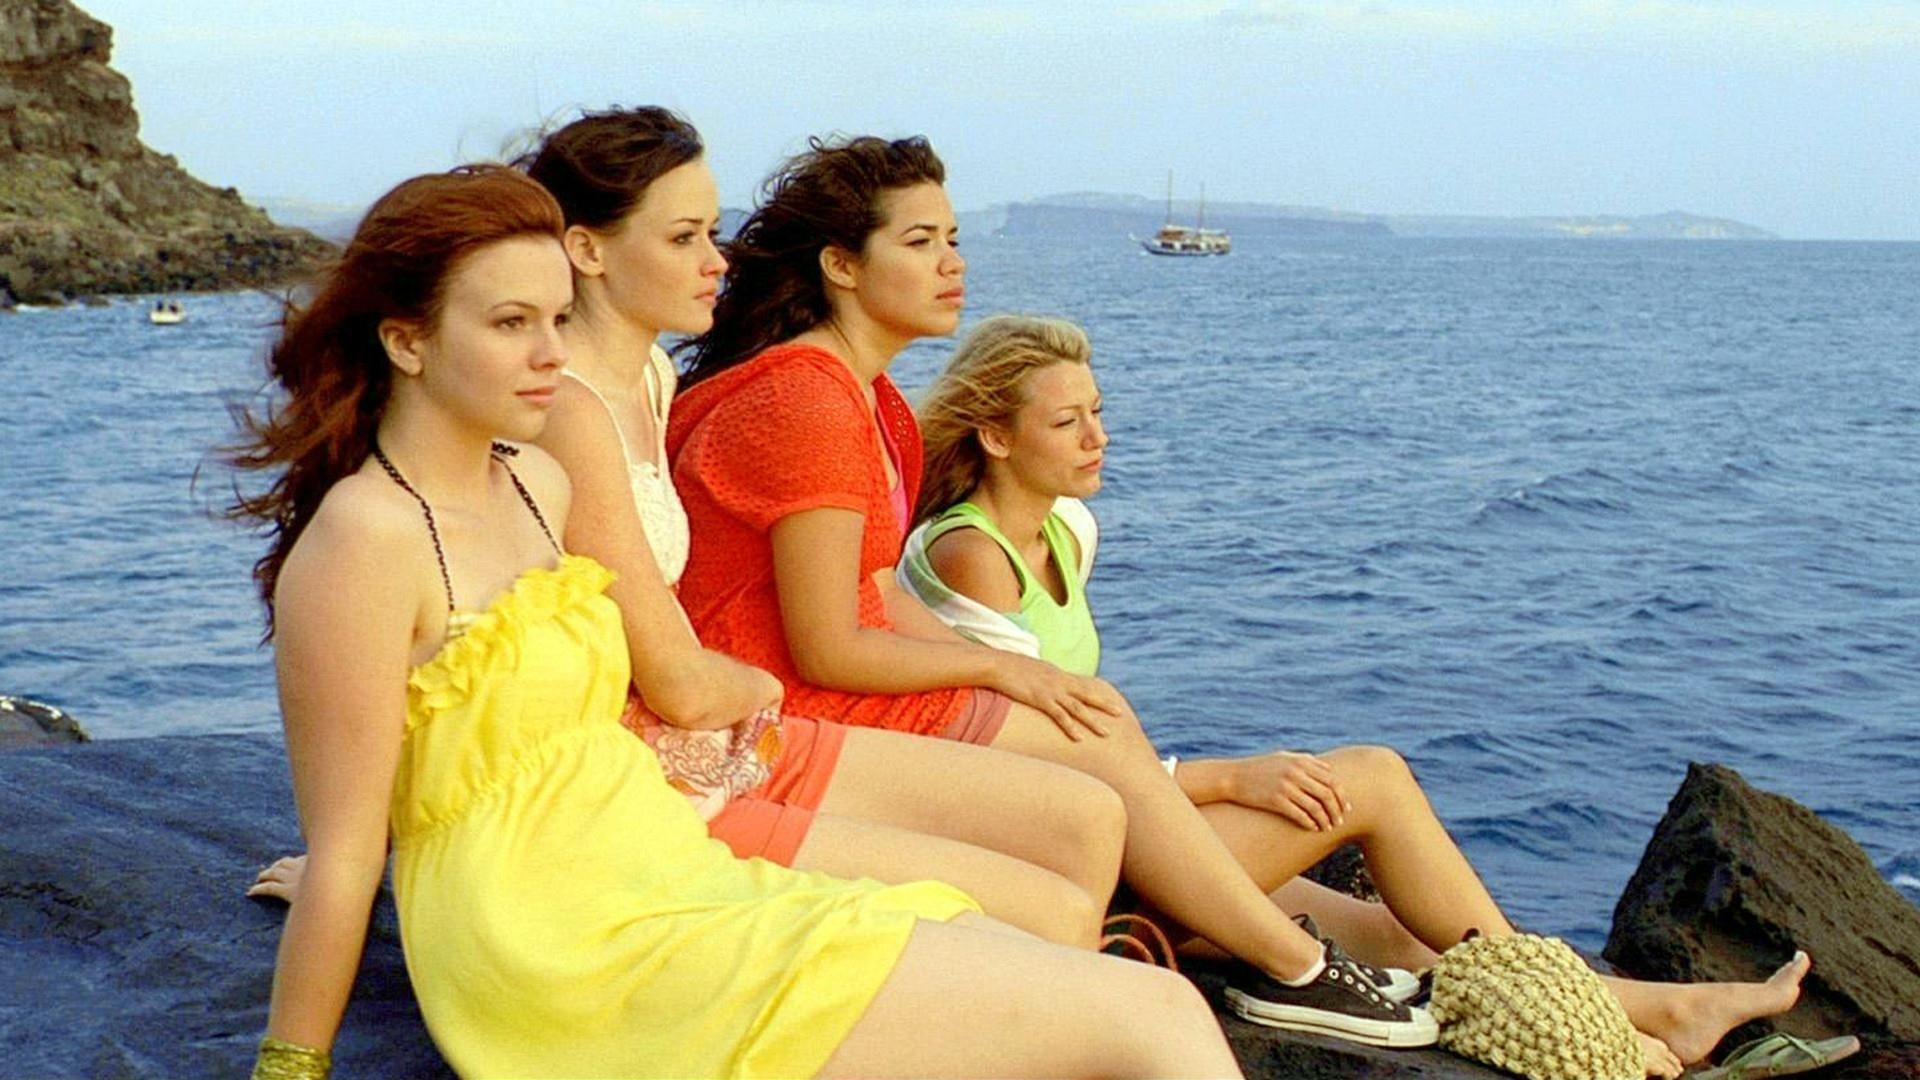 The Sisterhood of the Traveling Pants Trailer